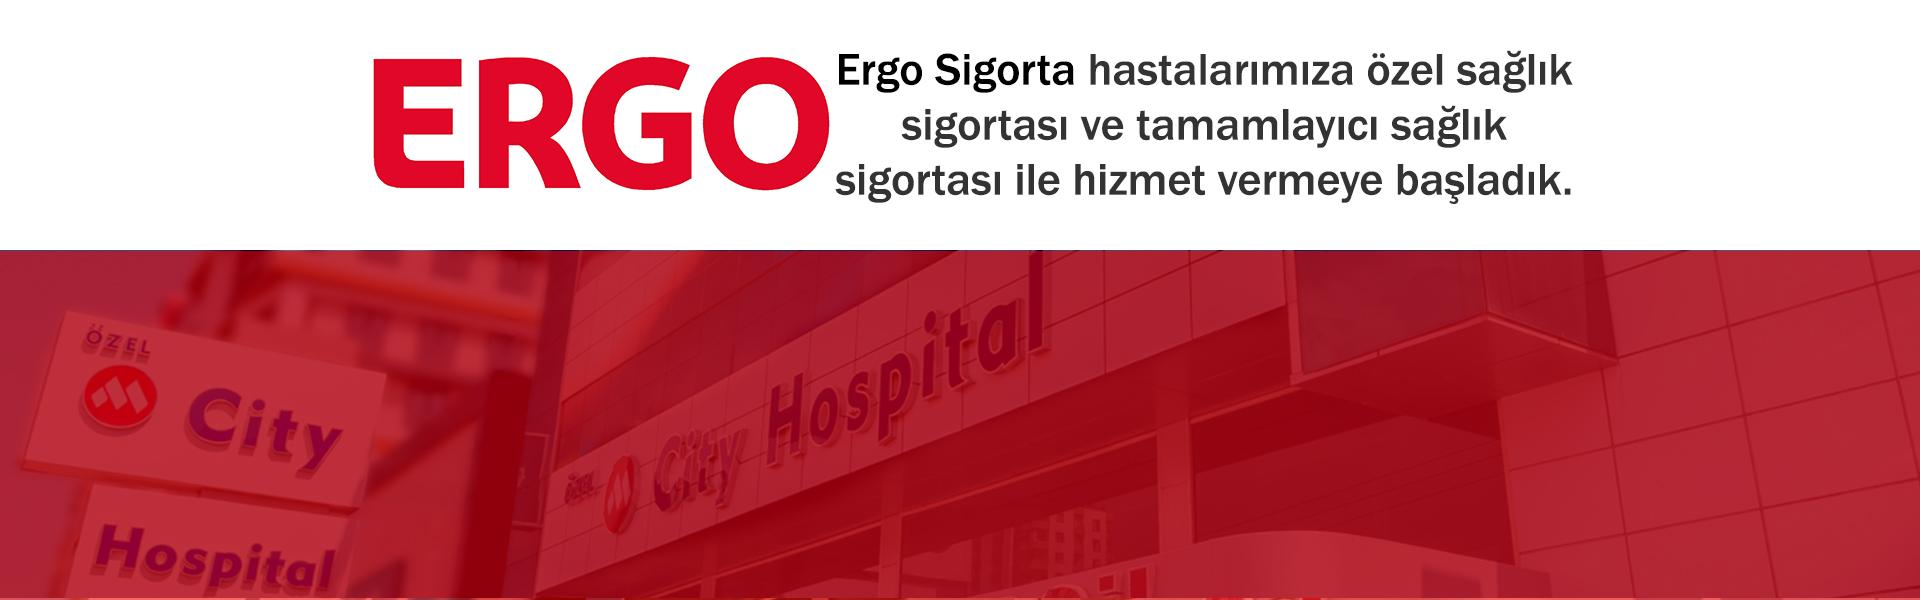 ergo-sigorta-cityhospital